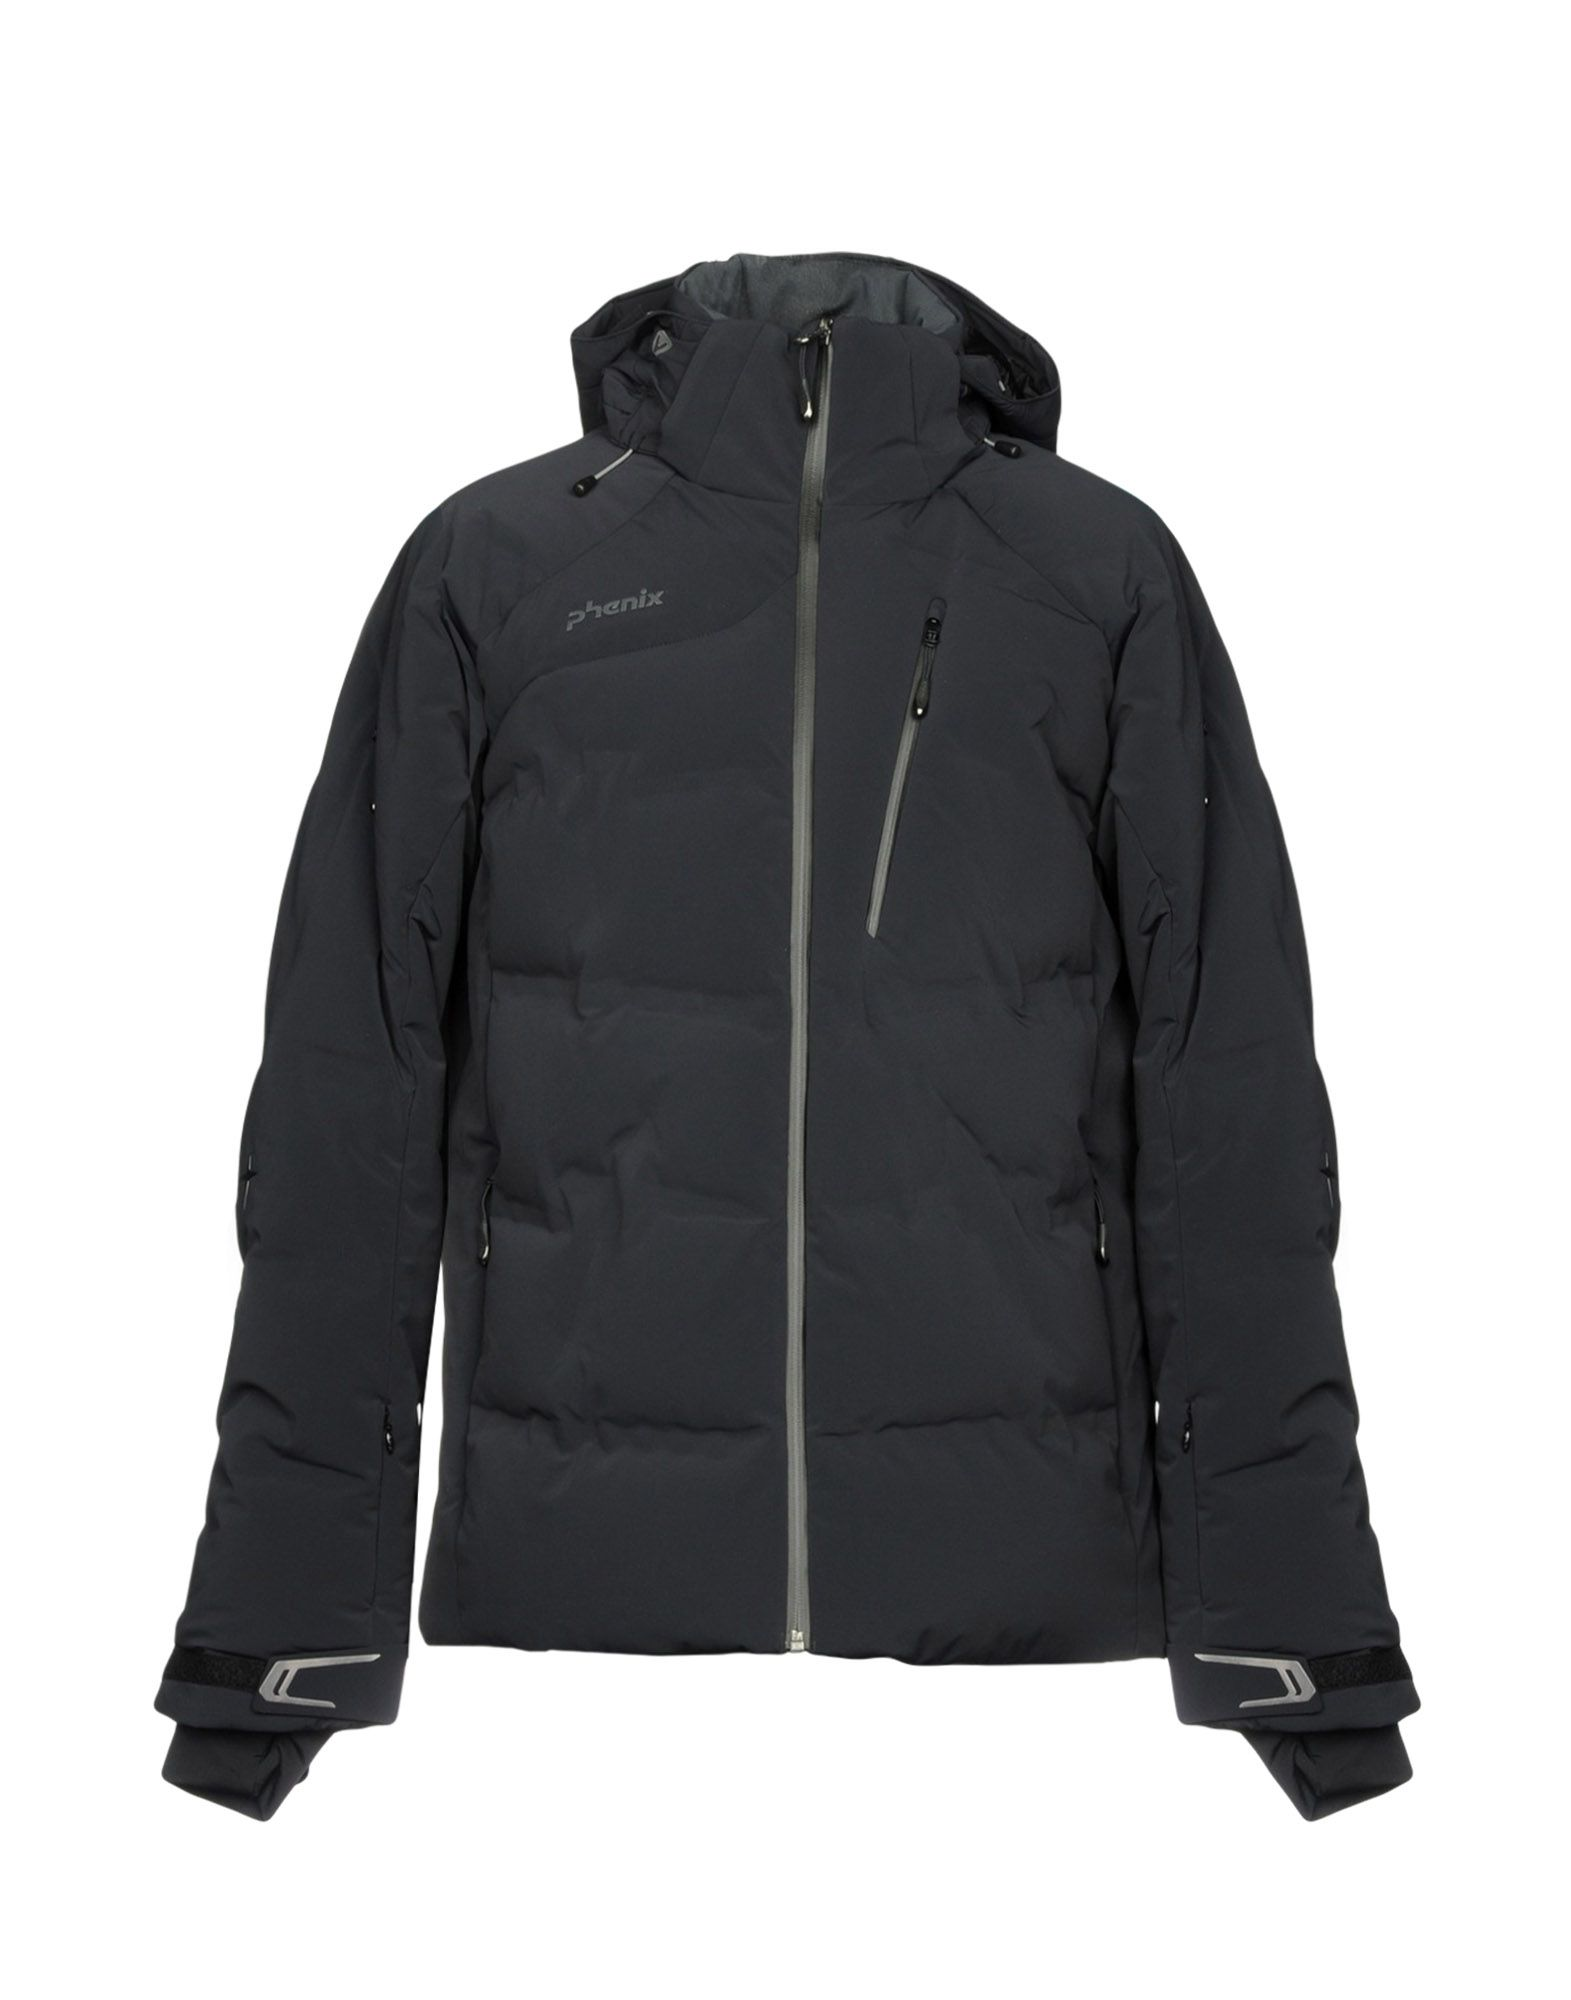 PHENIX Down Jacket in Black